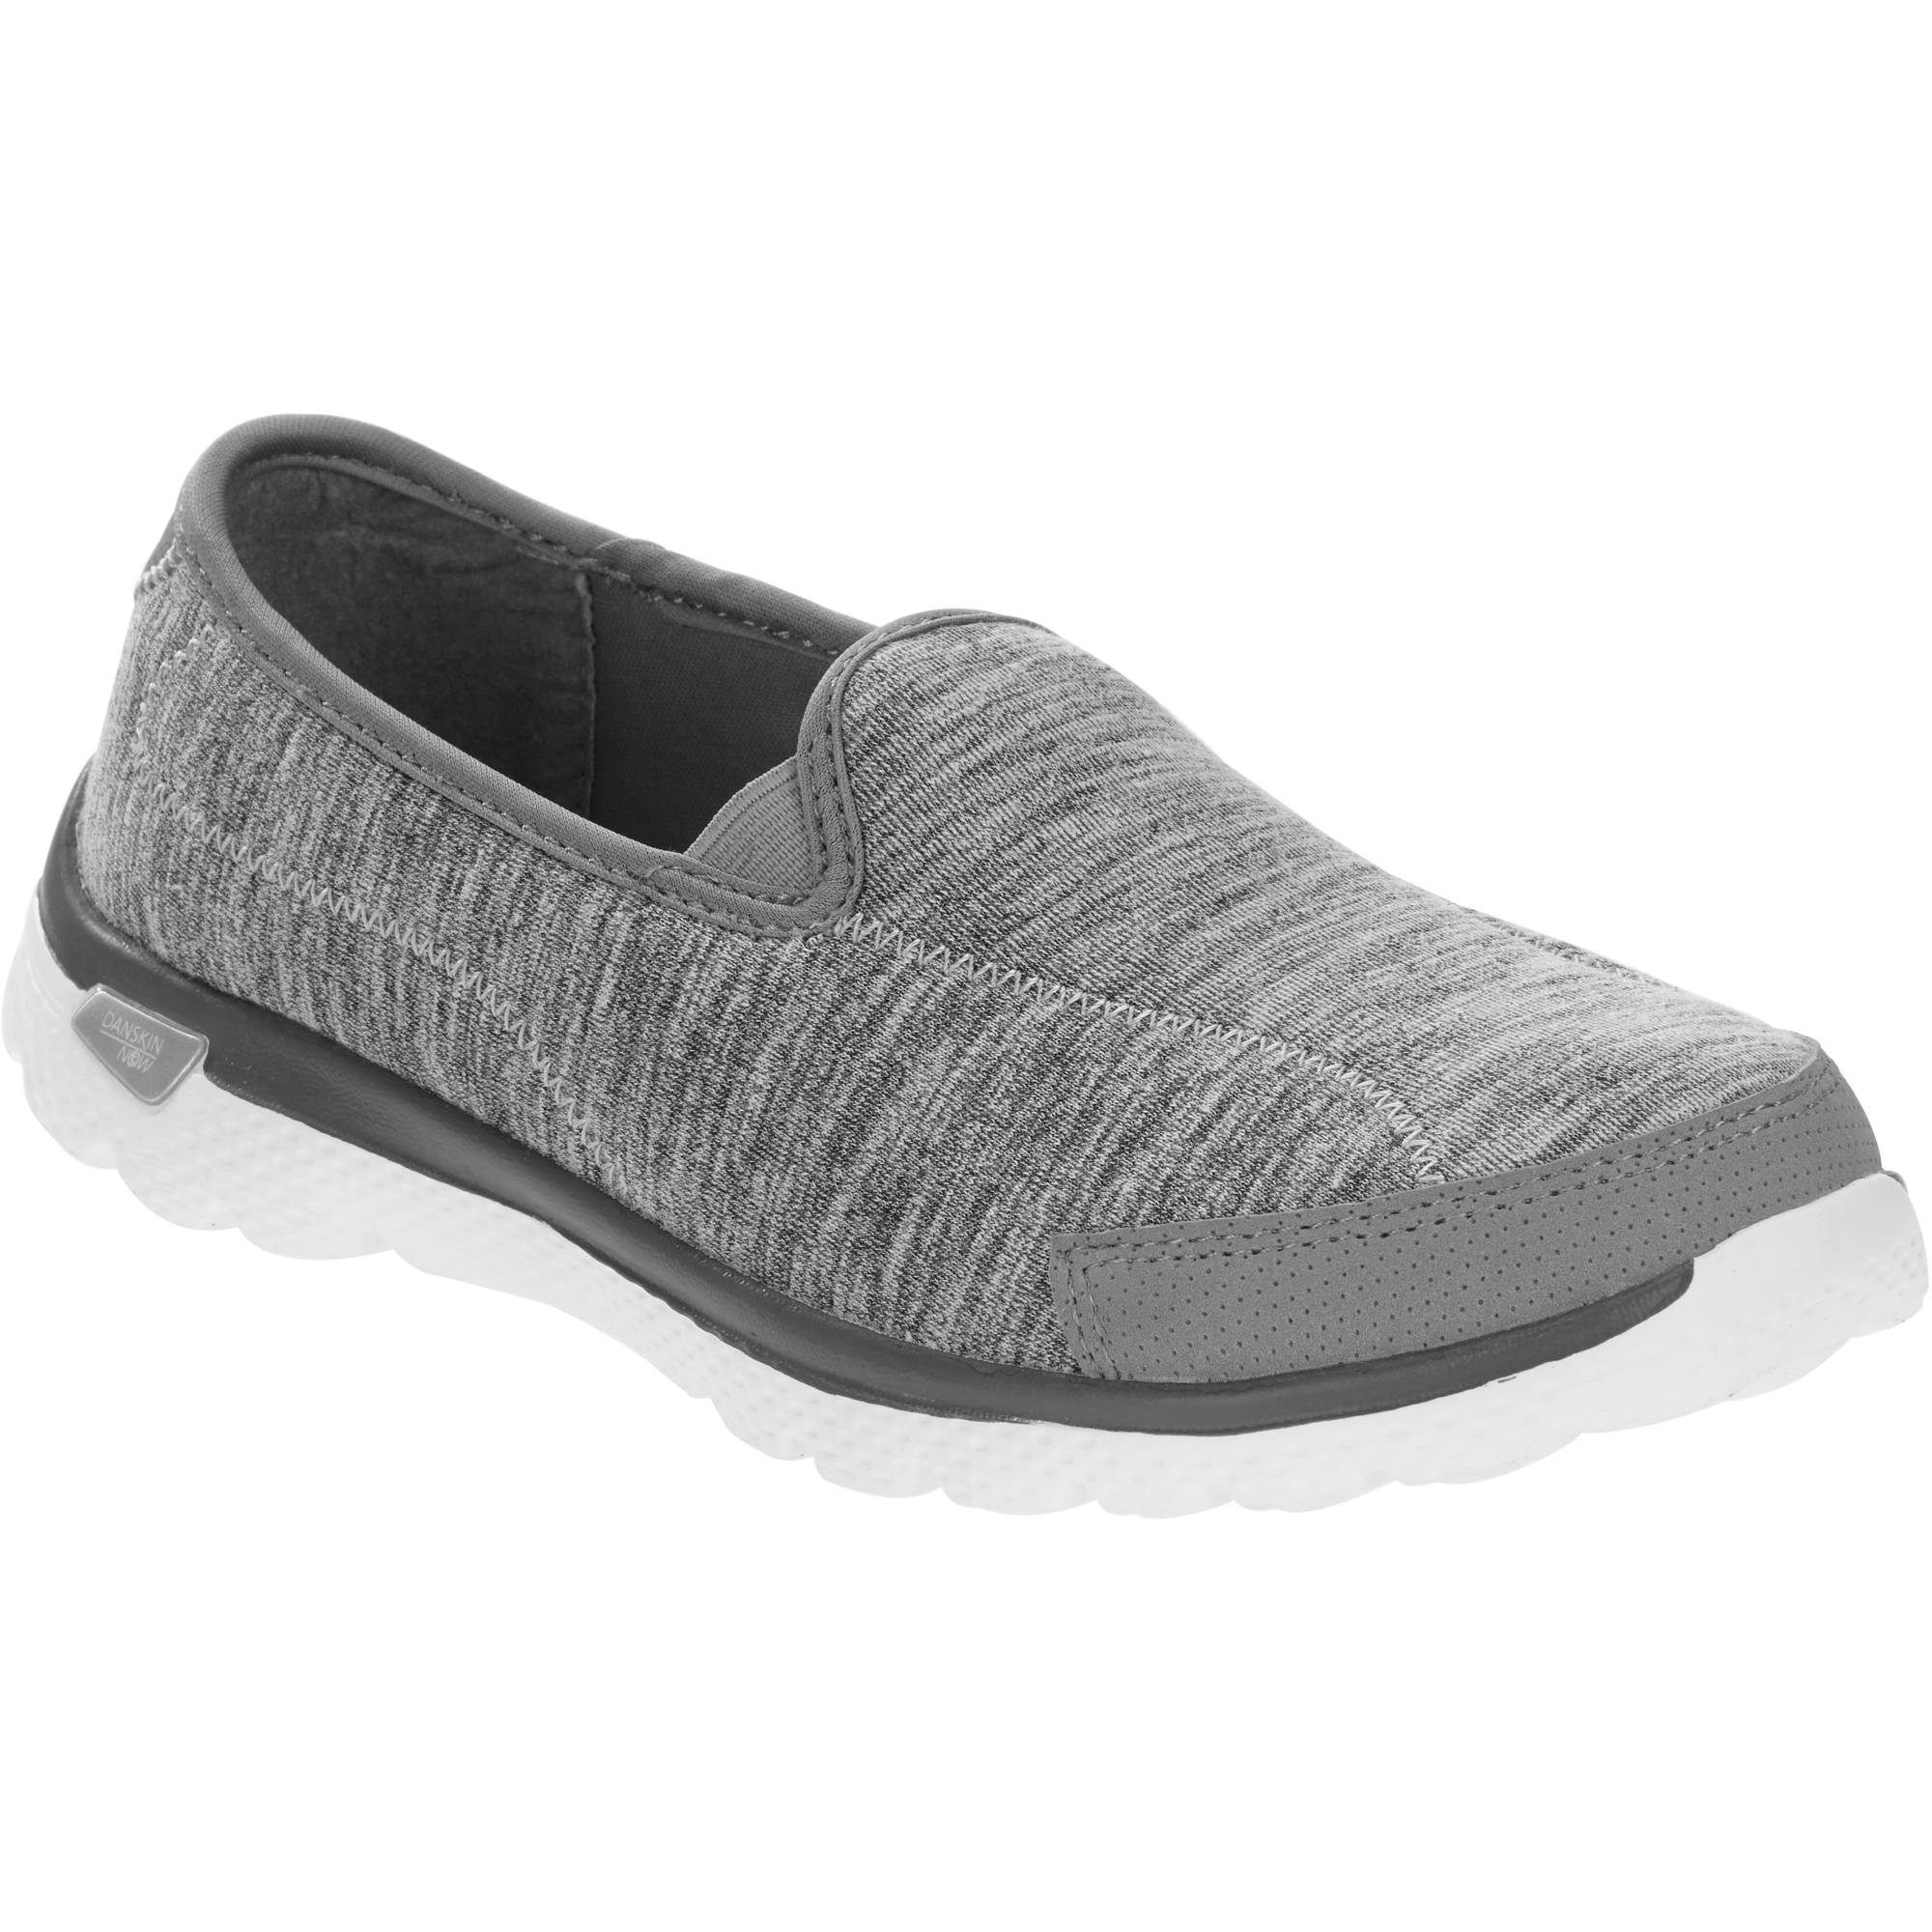 White Slip On Shoes Womens Walmart